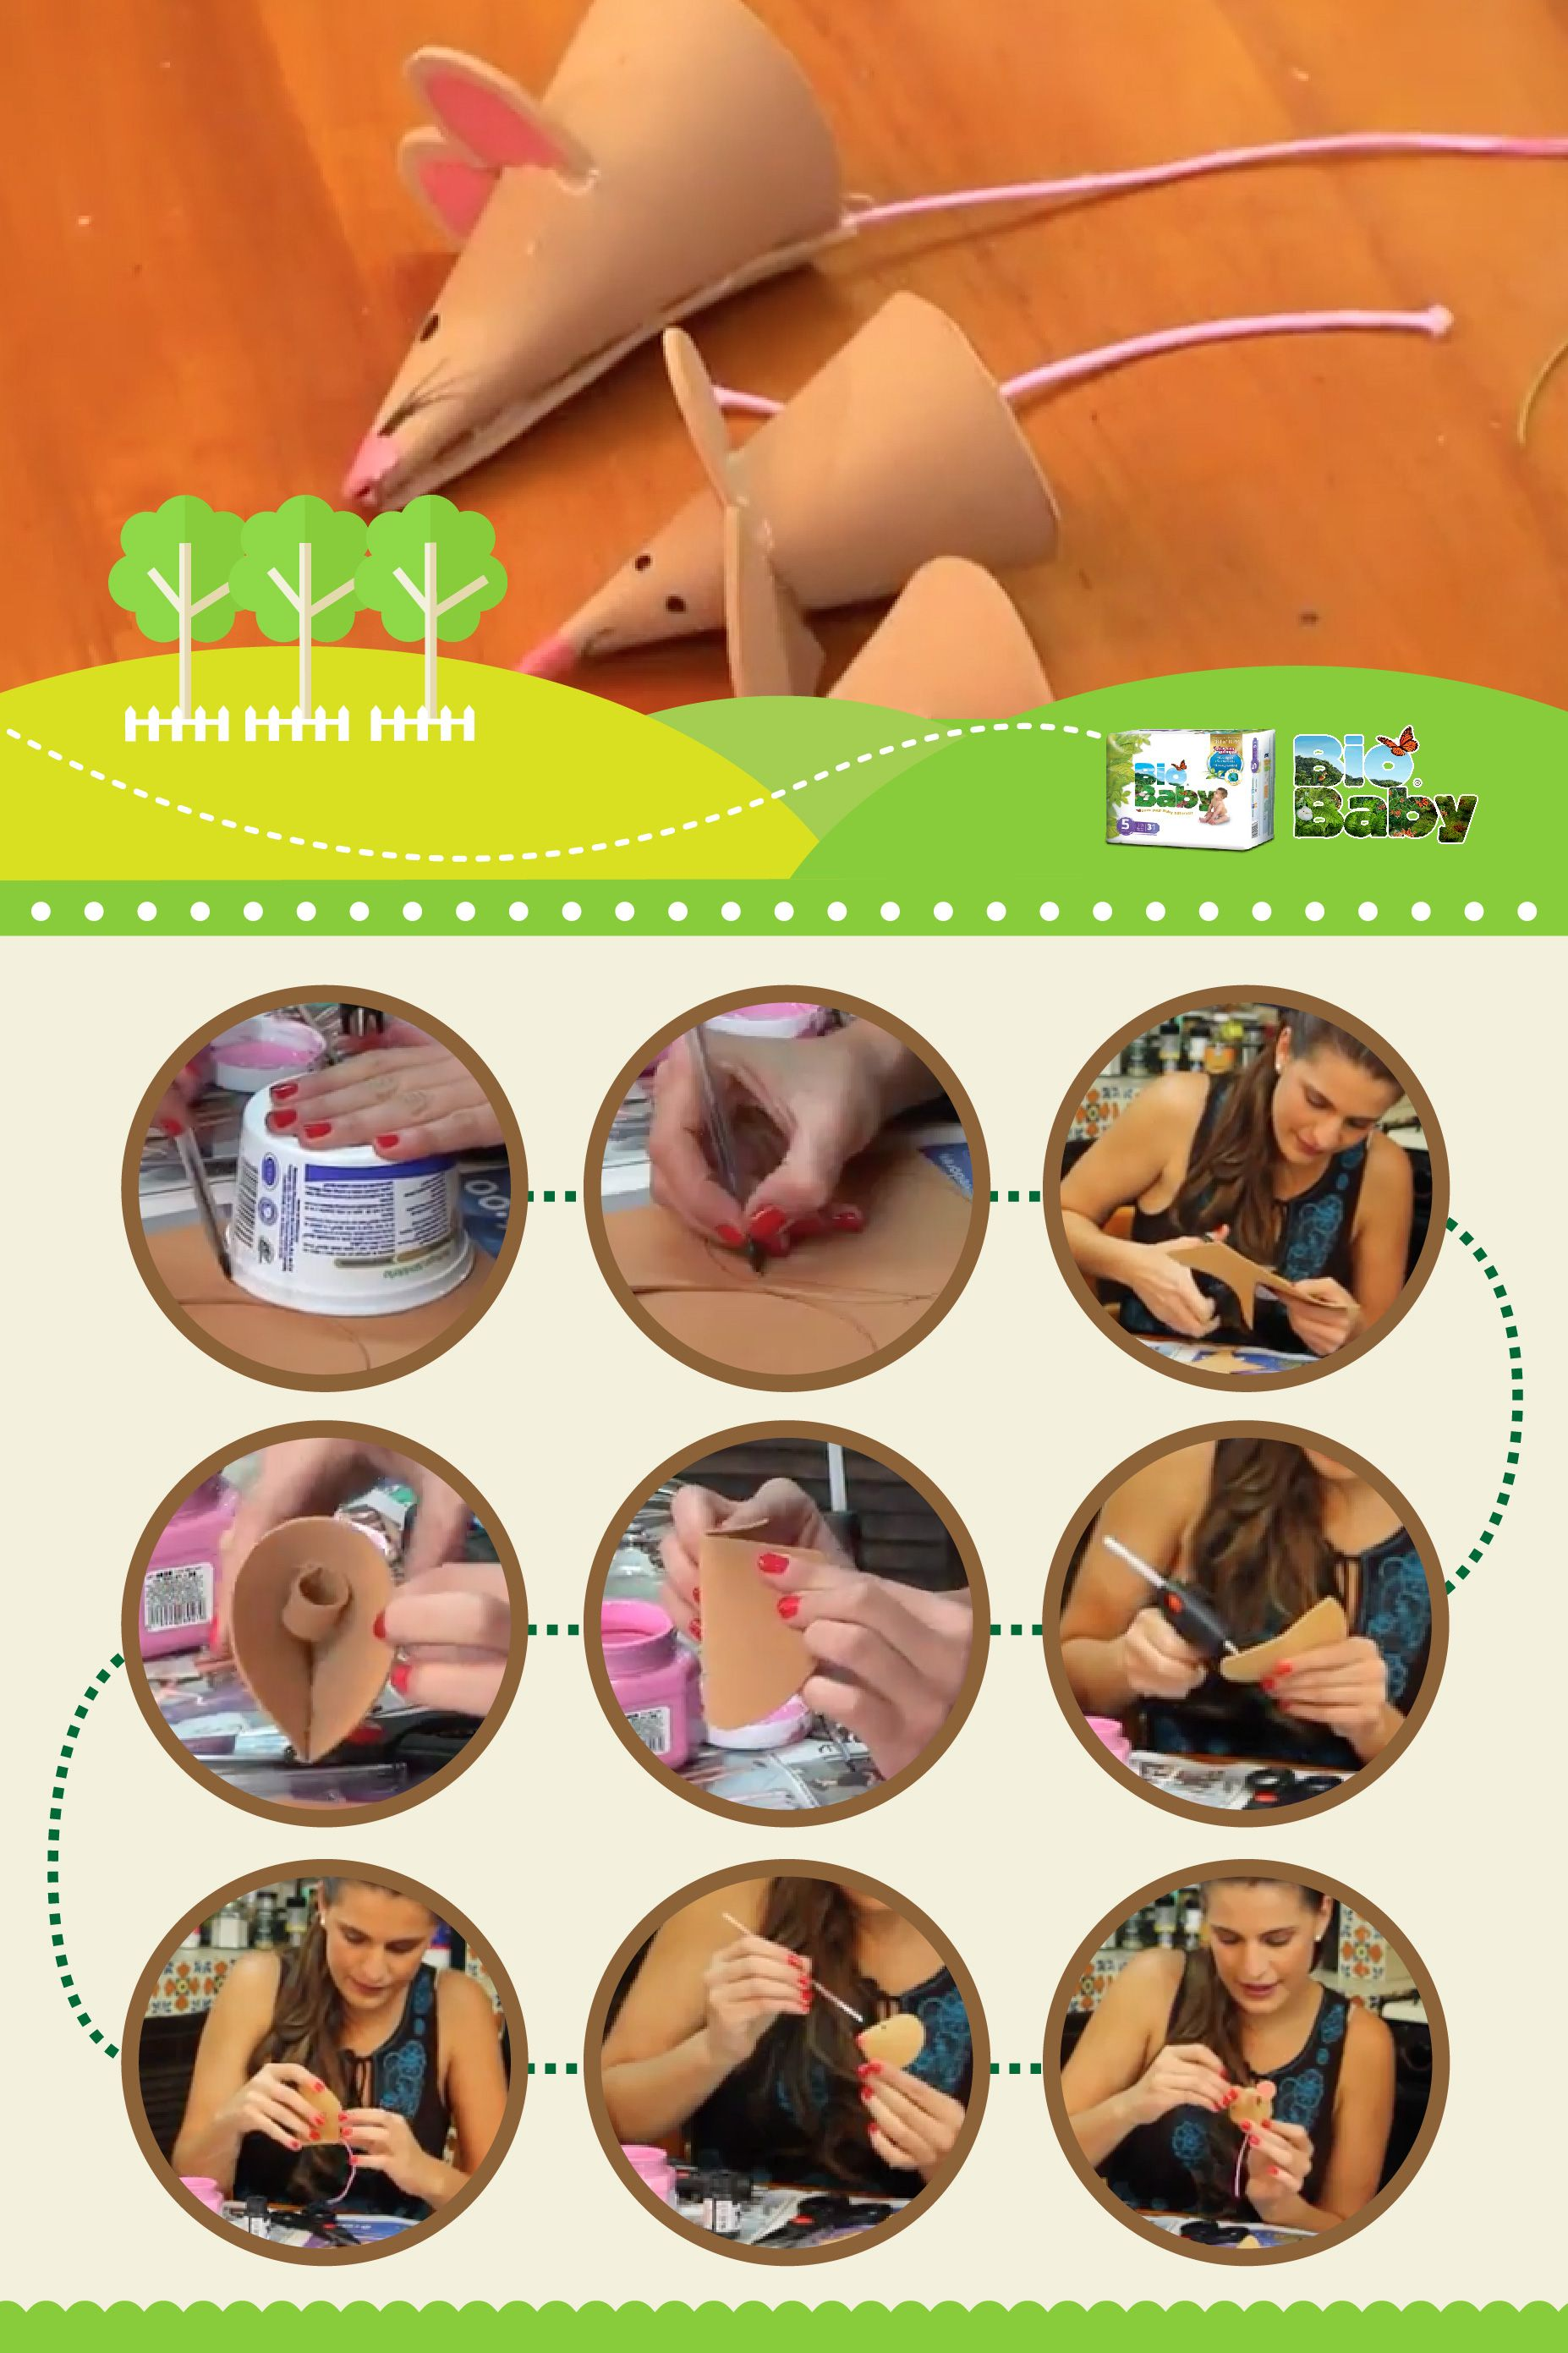 Diviértete creando historias con estas marionetas de ratoncitos para niños pequeños https://www.youtube.com/watch?v=gBsalpelO7M